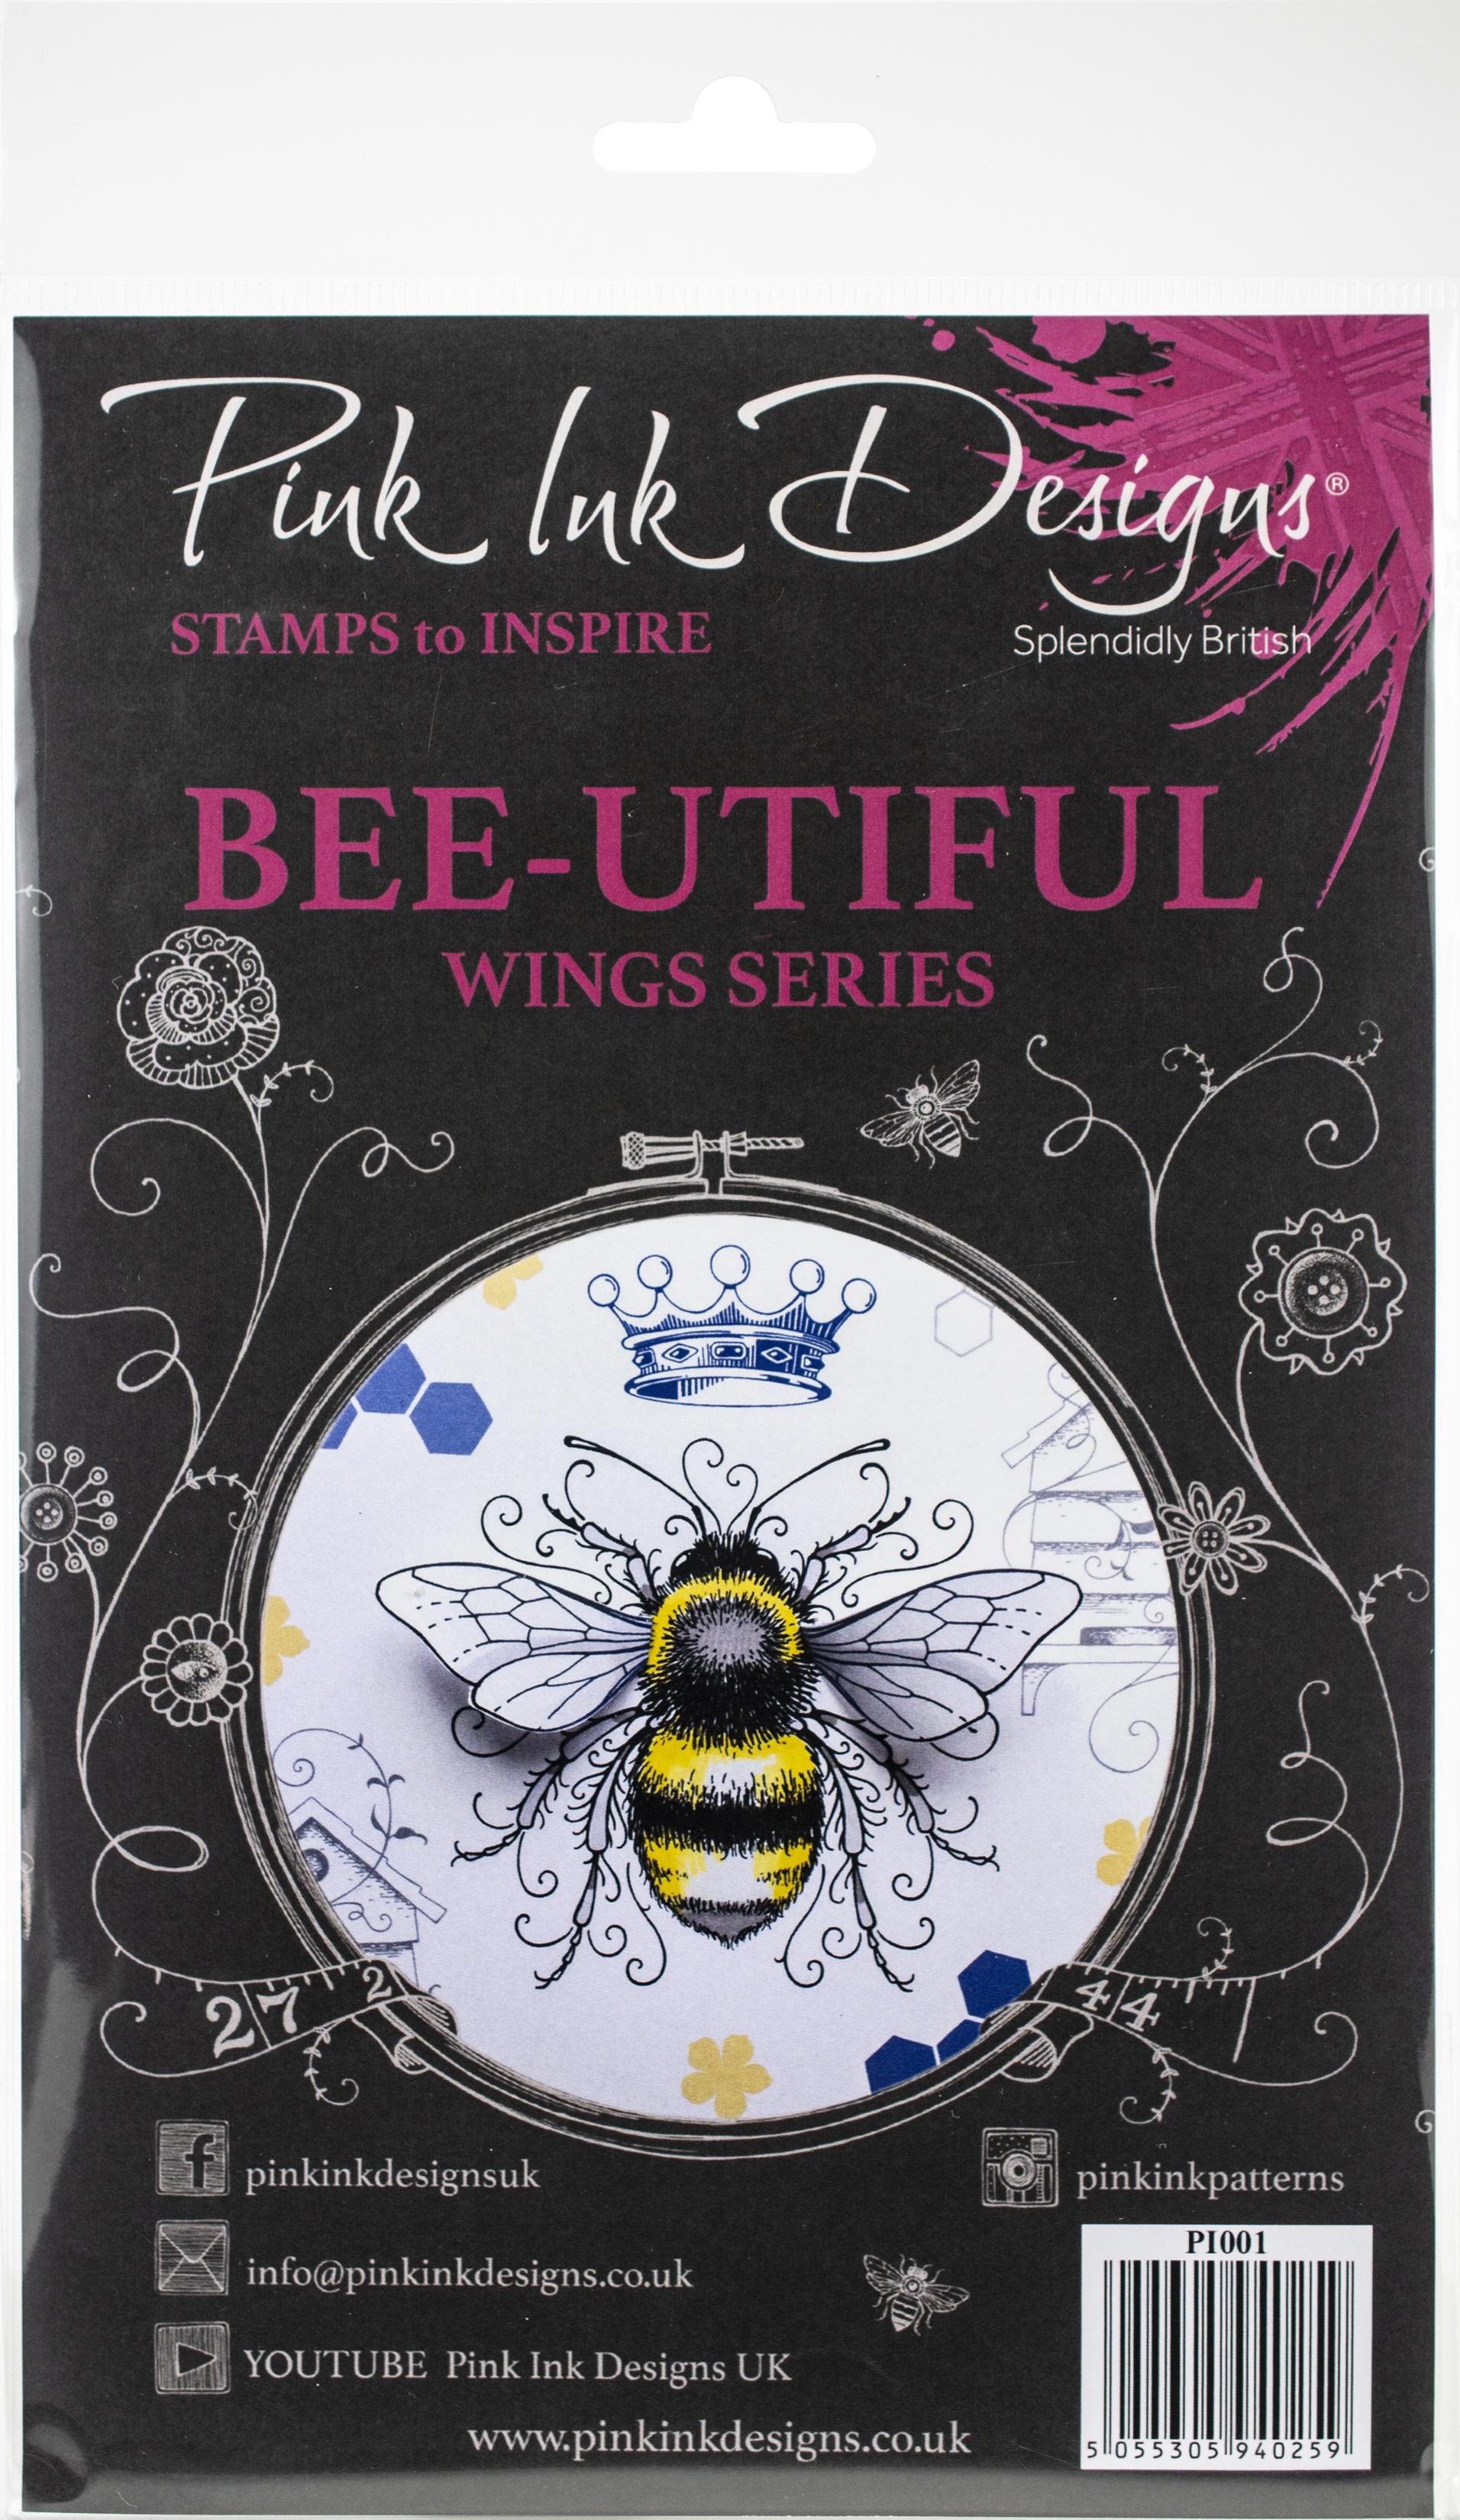 Pink Ink Designs A5 Clear Stamp Set-Bee-Utiful